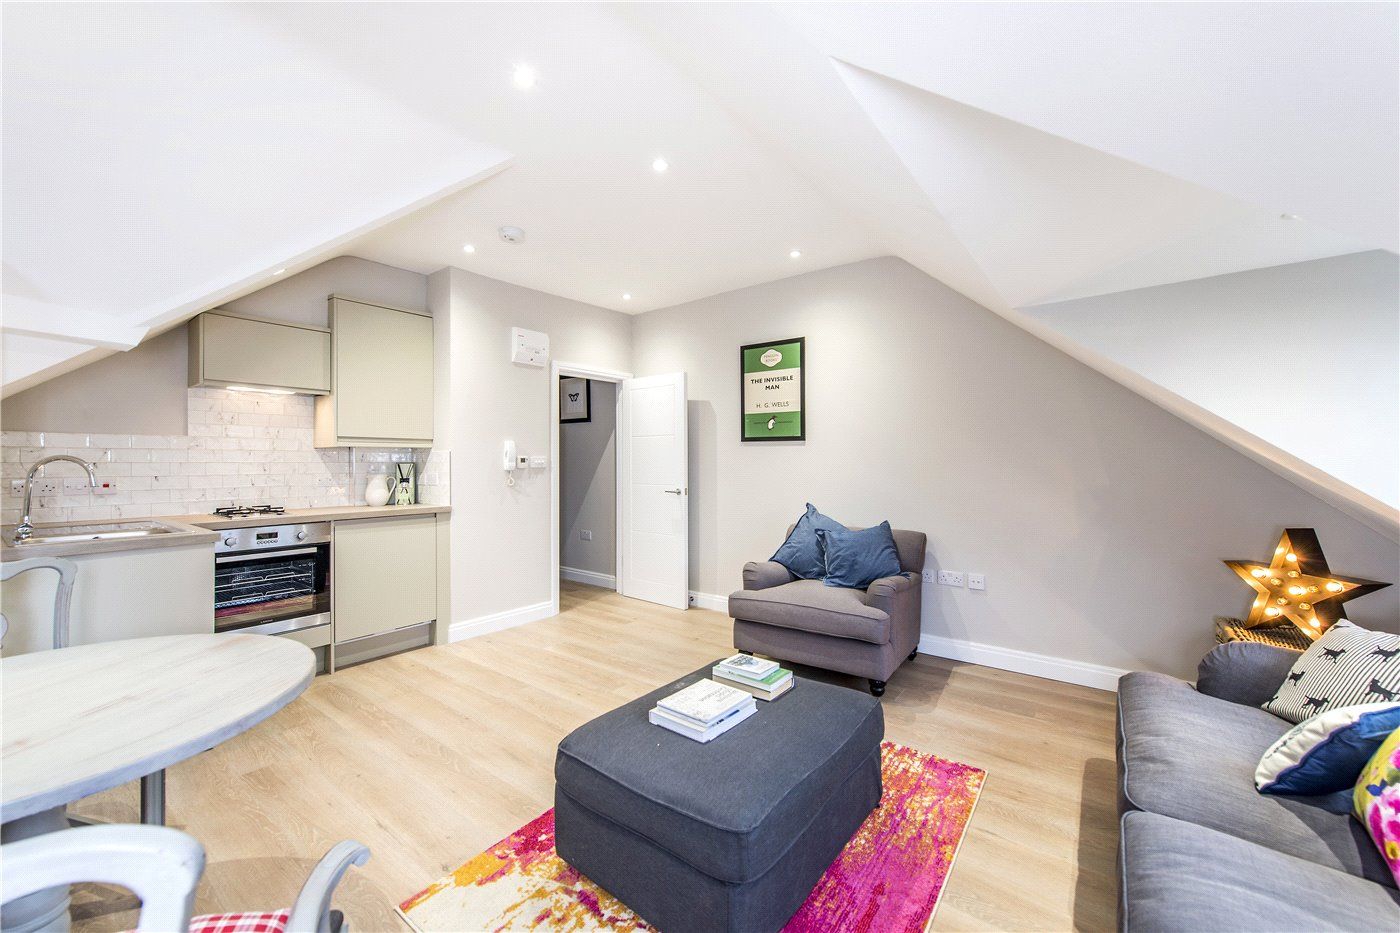 Tremendous Property To Rent In Drewstead Road London Sw16 995 Pcm Download Free Architecture Designs Scobabritishbridgeorg